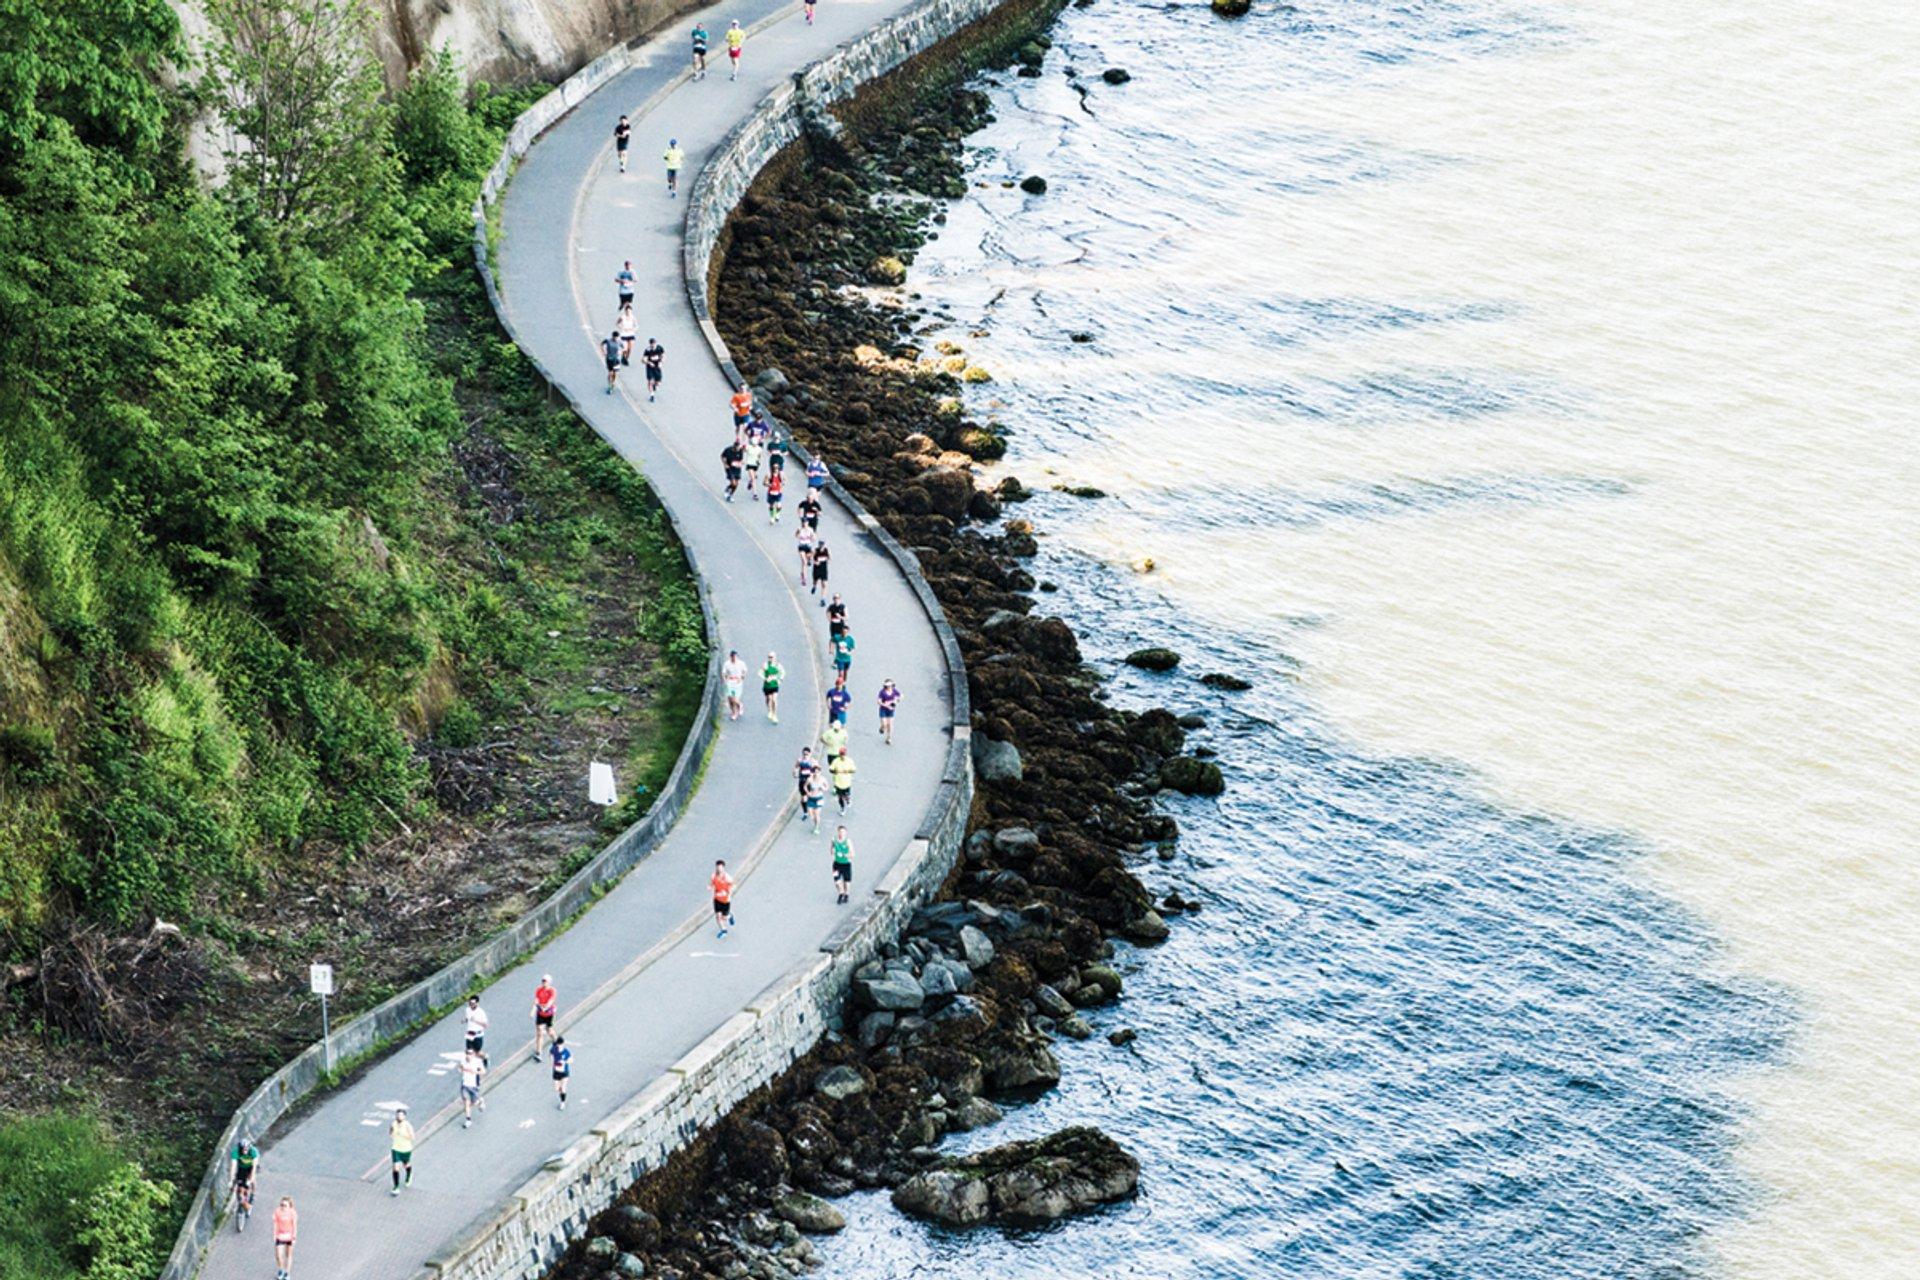 Vancouver Marathon in Vancouver - Best Season 2020